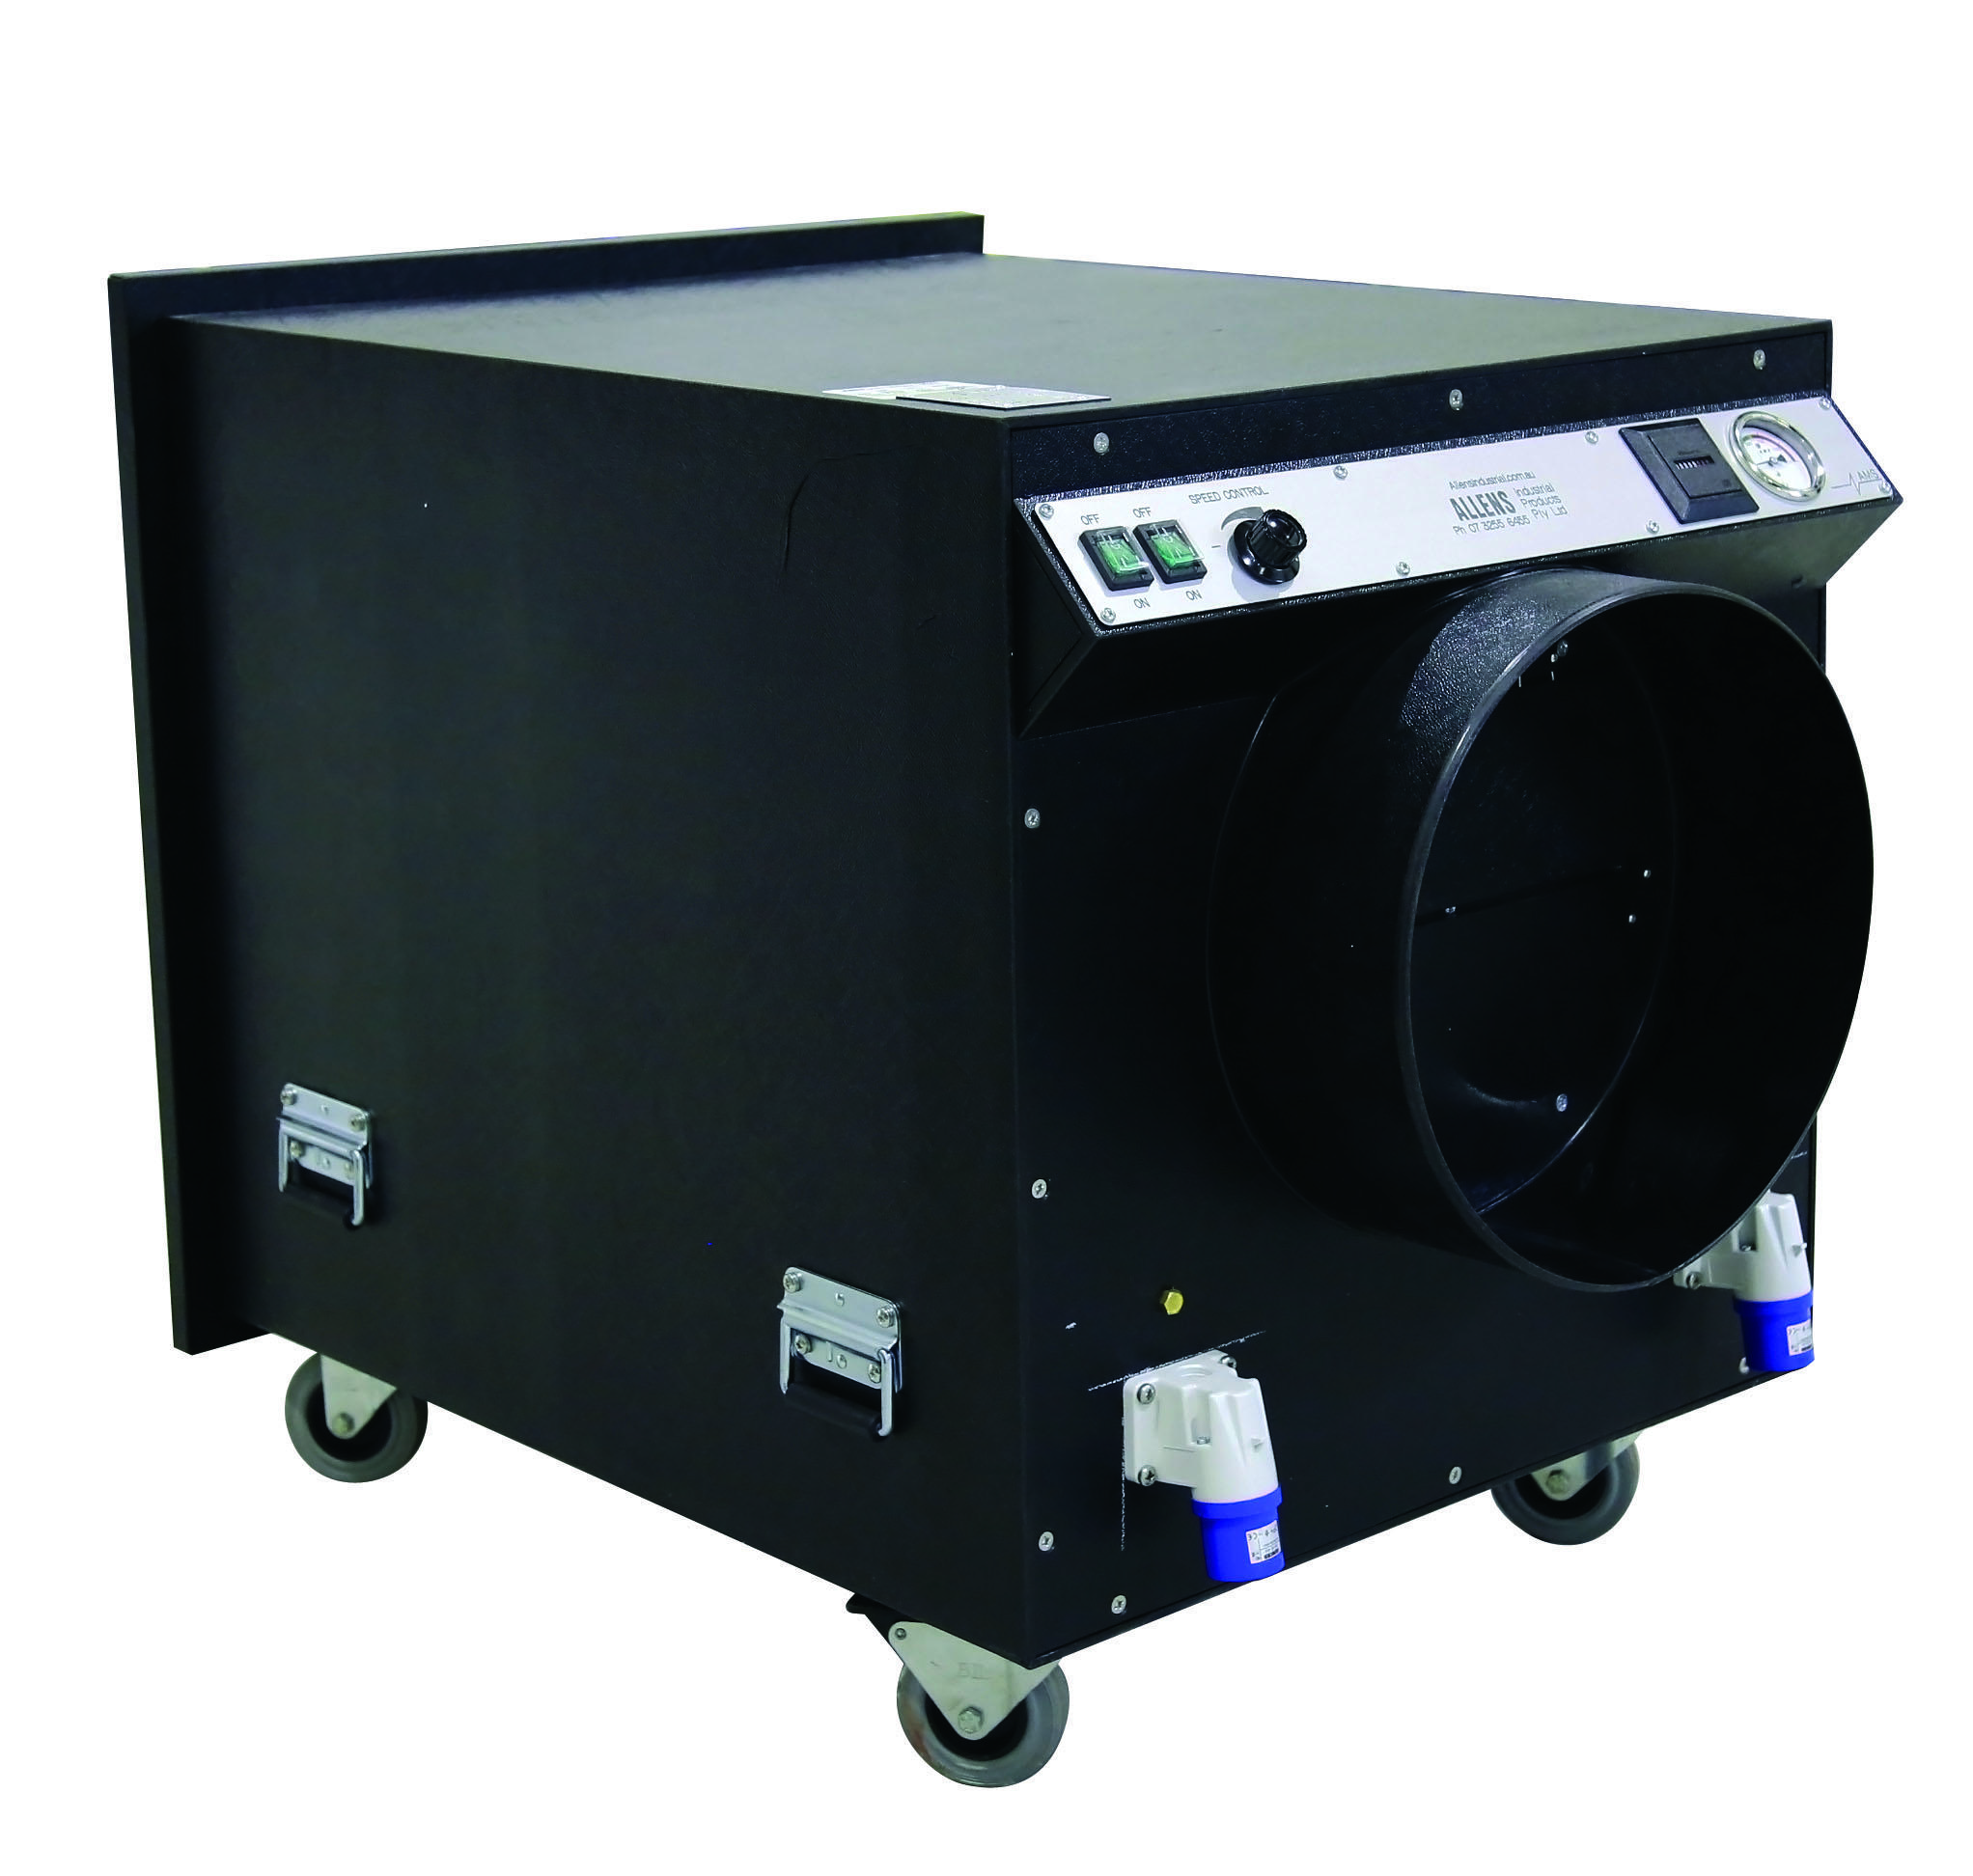 Negative Pressure Air Unit AMS4000